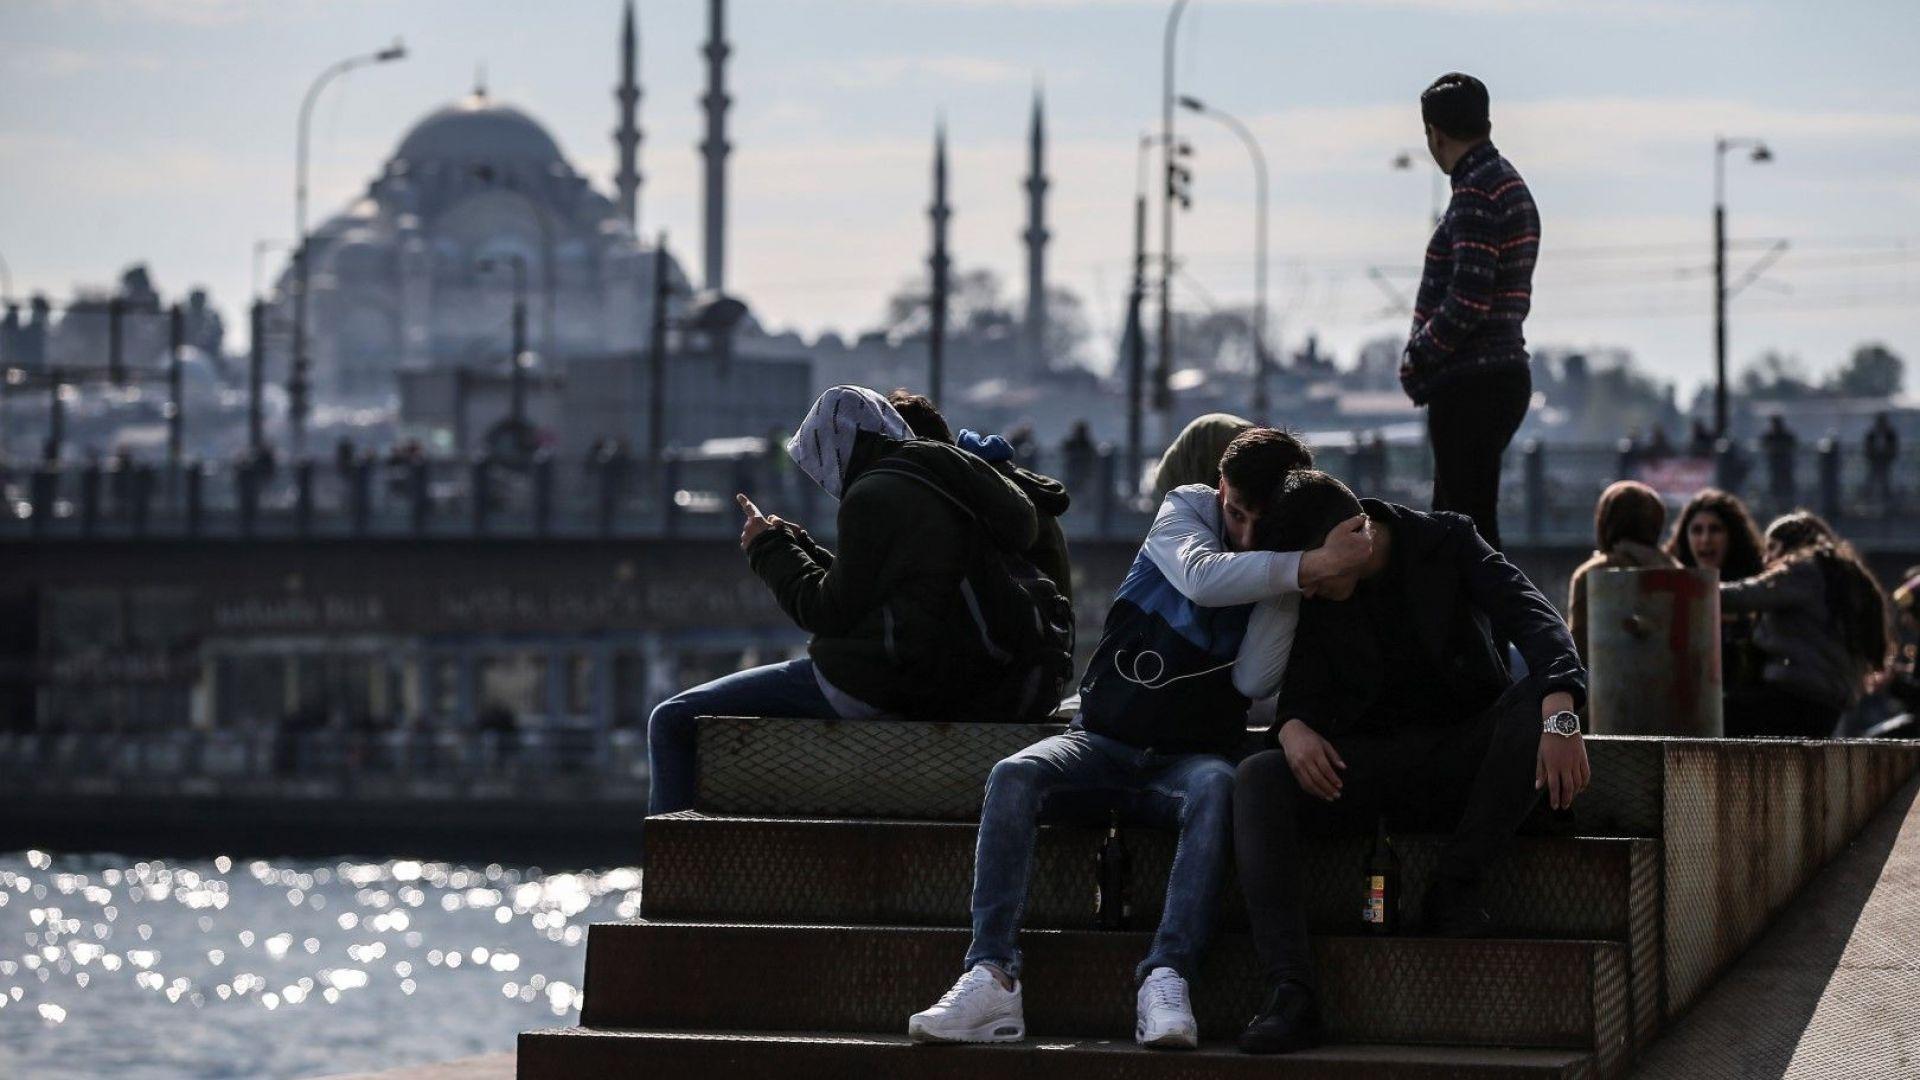 Мощен трус от 6 по Рихтер разлюля Истанбул, усети се силно и в Бургас (видео)